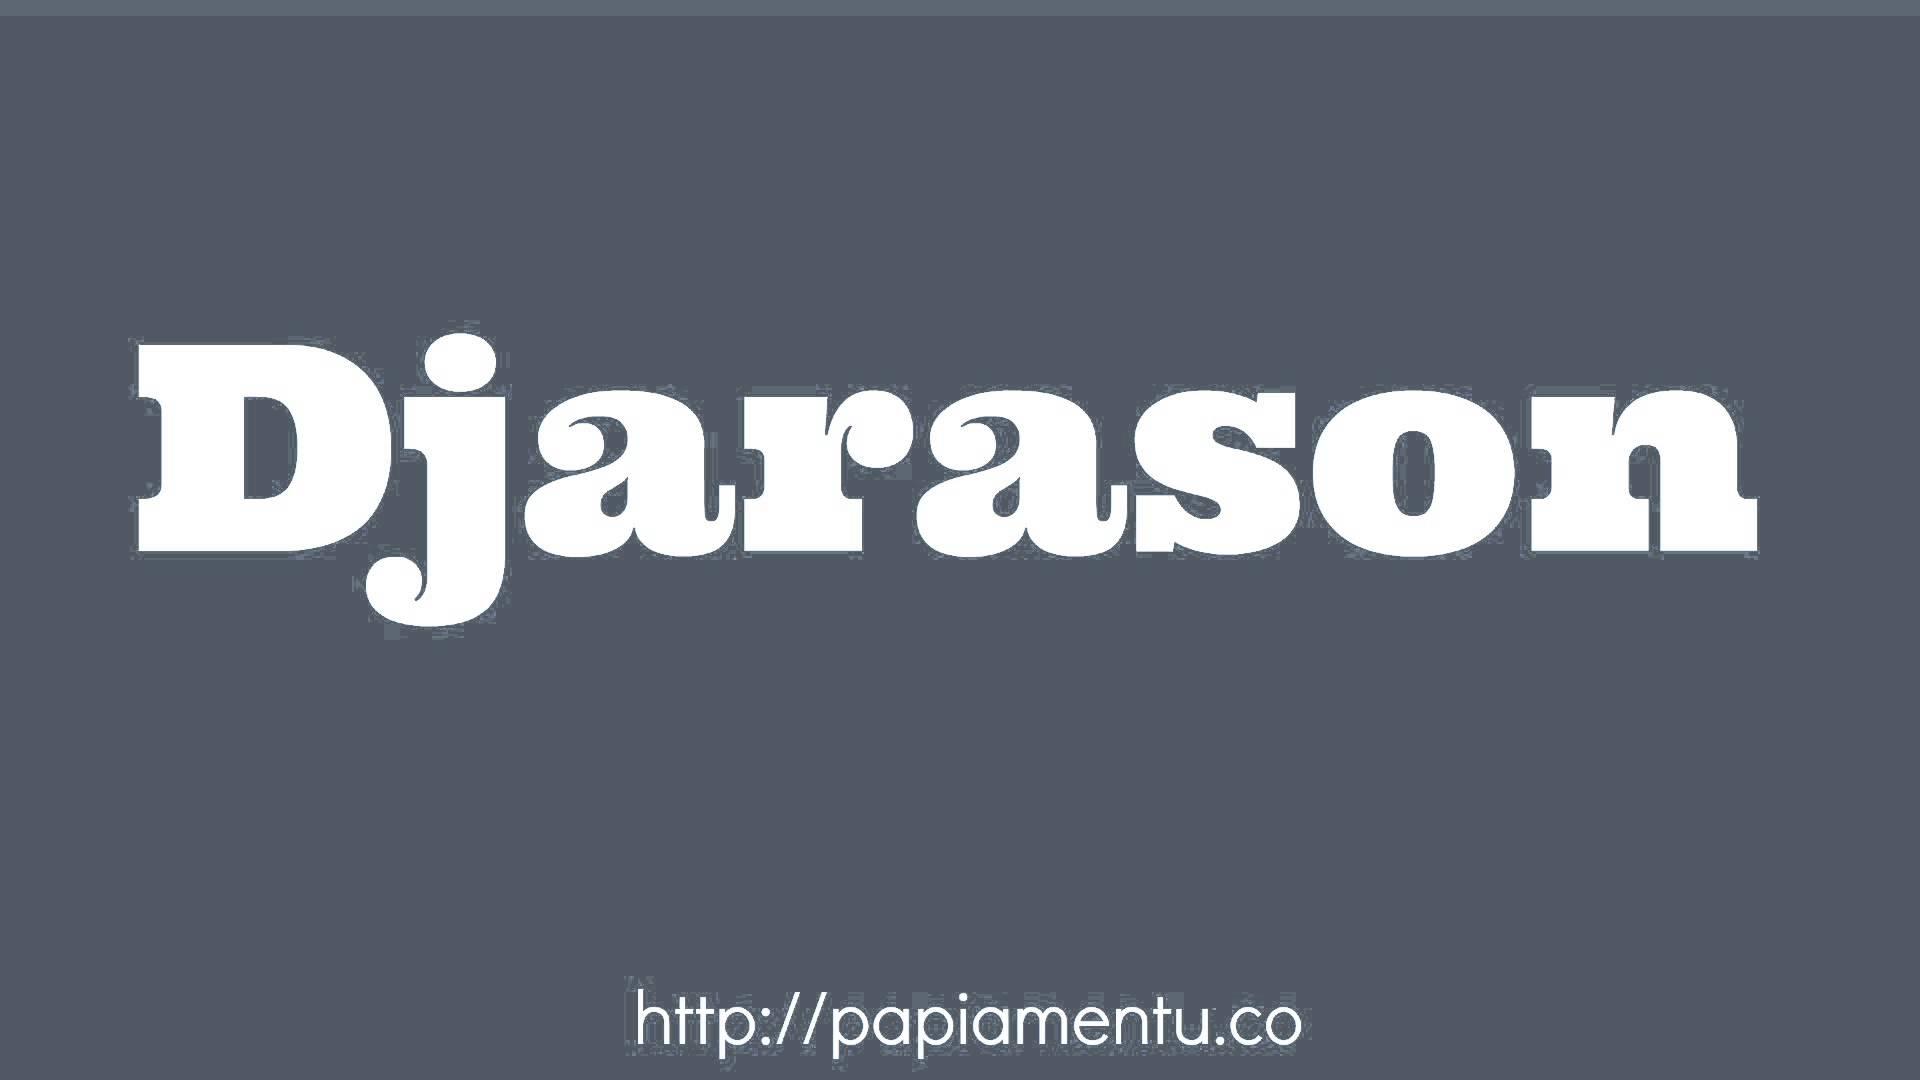 Zo zeg je Djarason (Woensdag) In Papiamentu